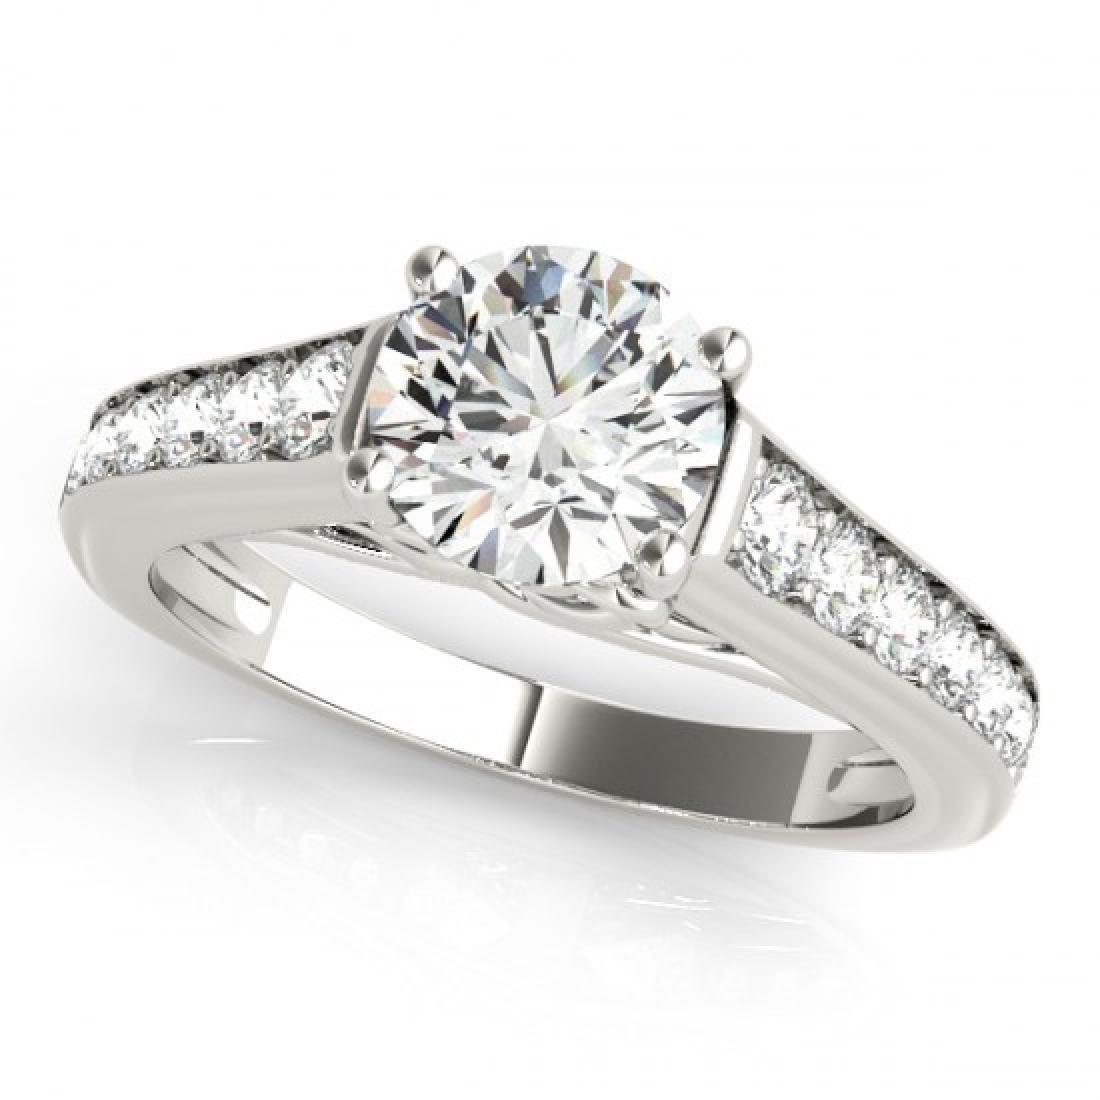 1 CTW Certified VS/SI Diamond Solitaire Ring 18K White